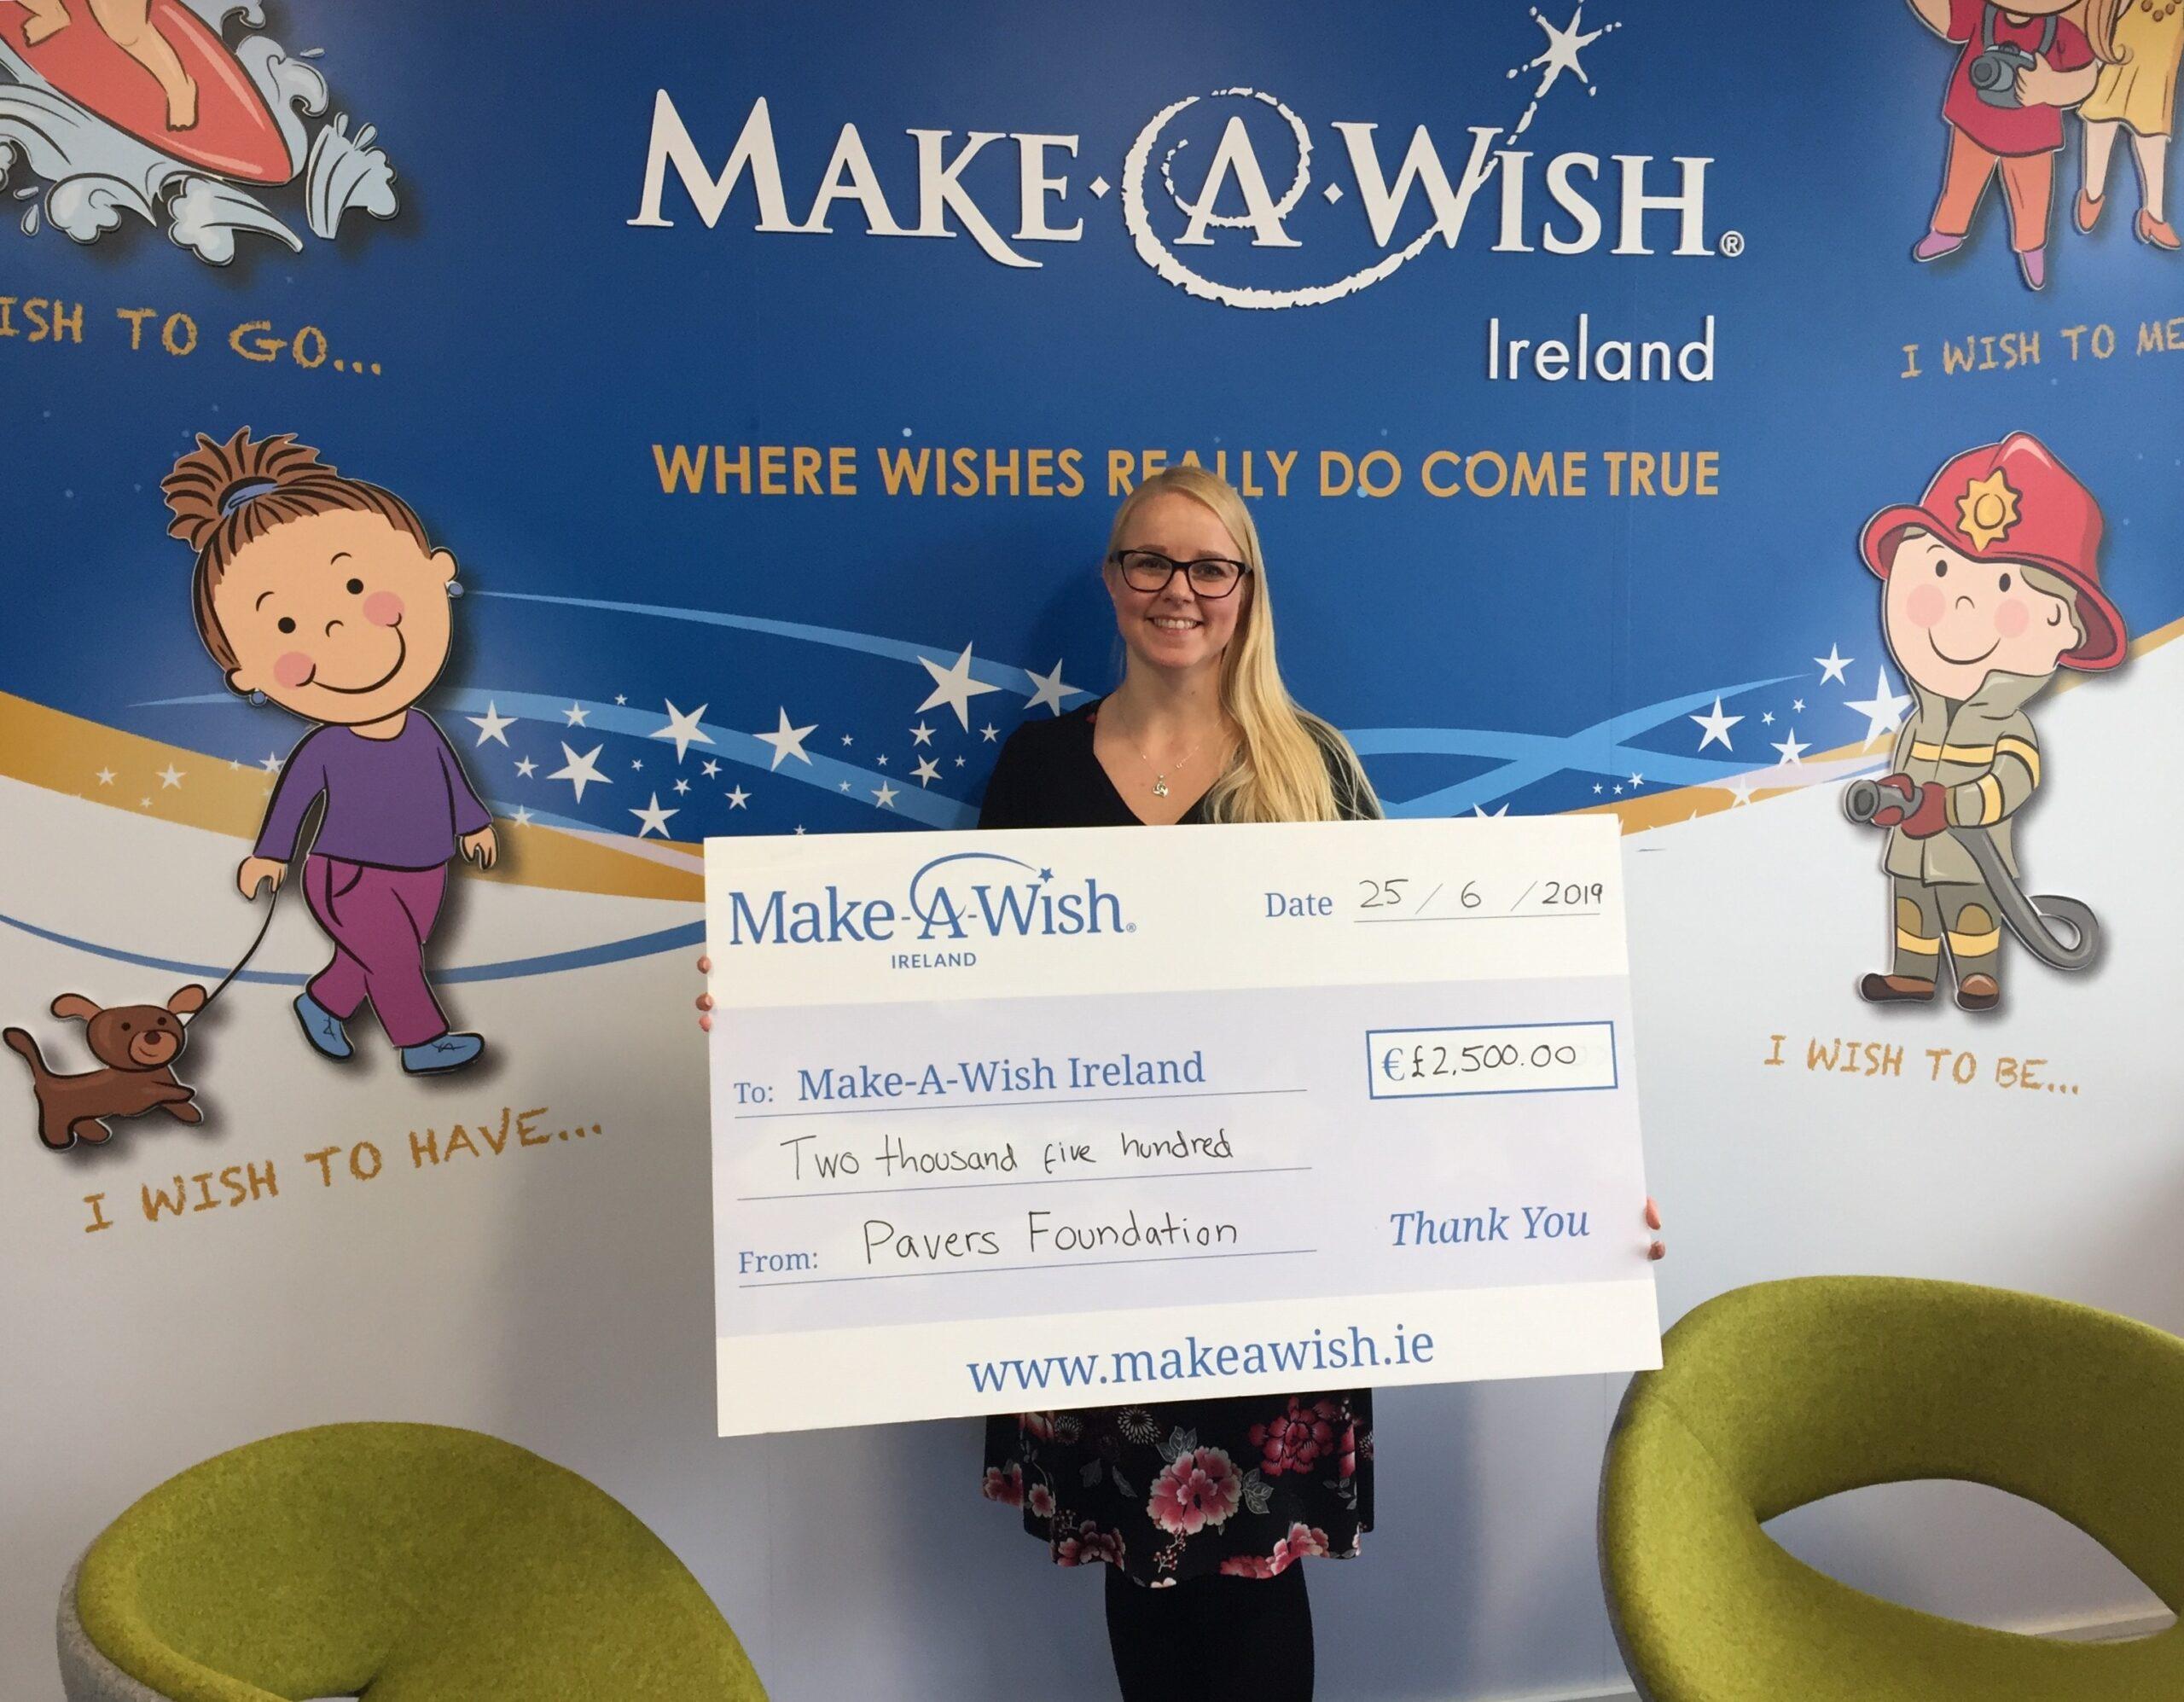 Make a Wish Ireland Receives £2,500 Following Employee Vote